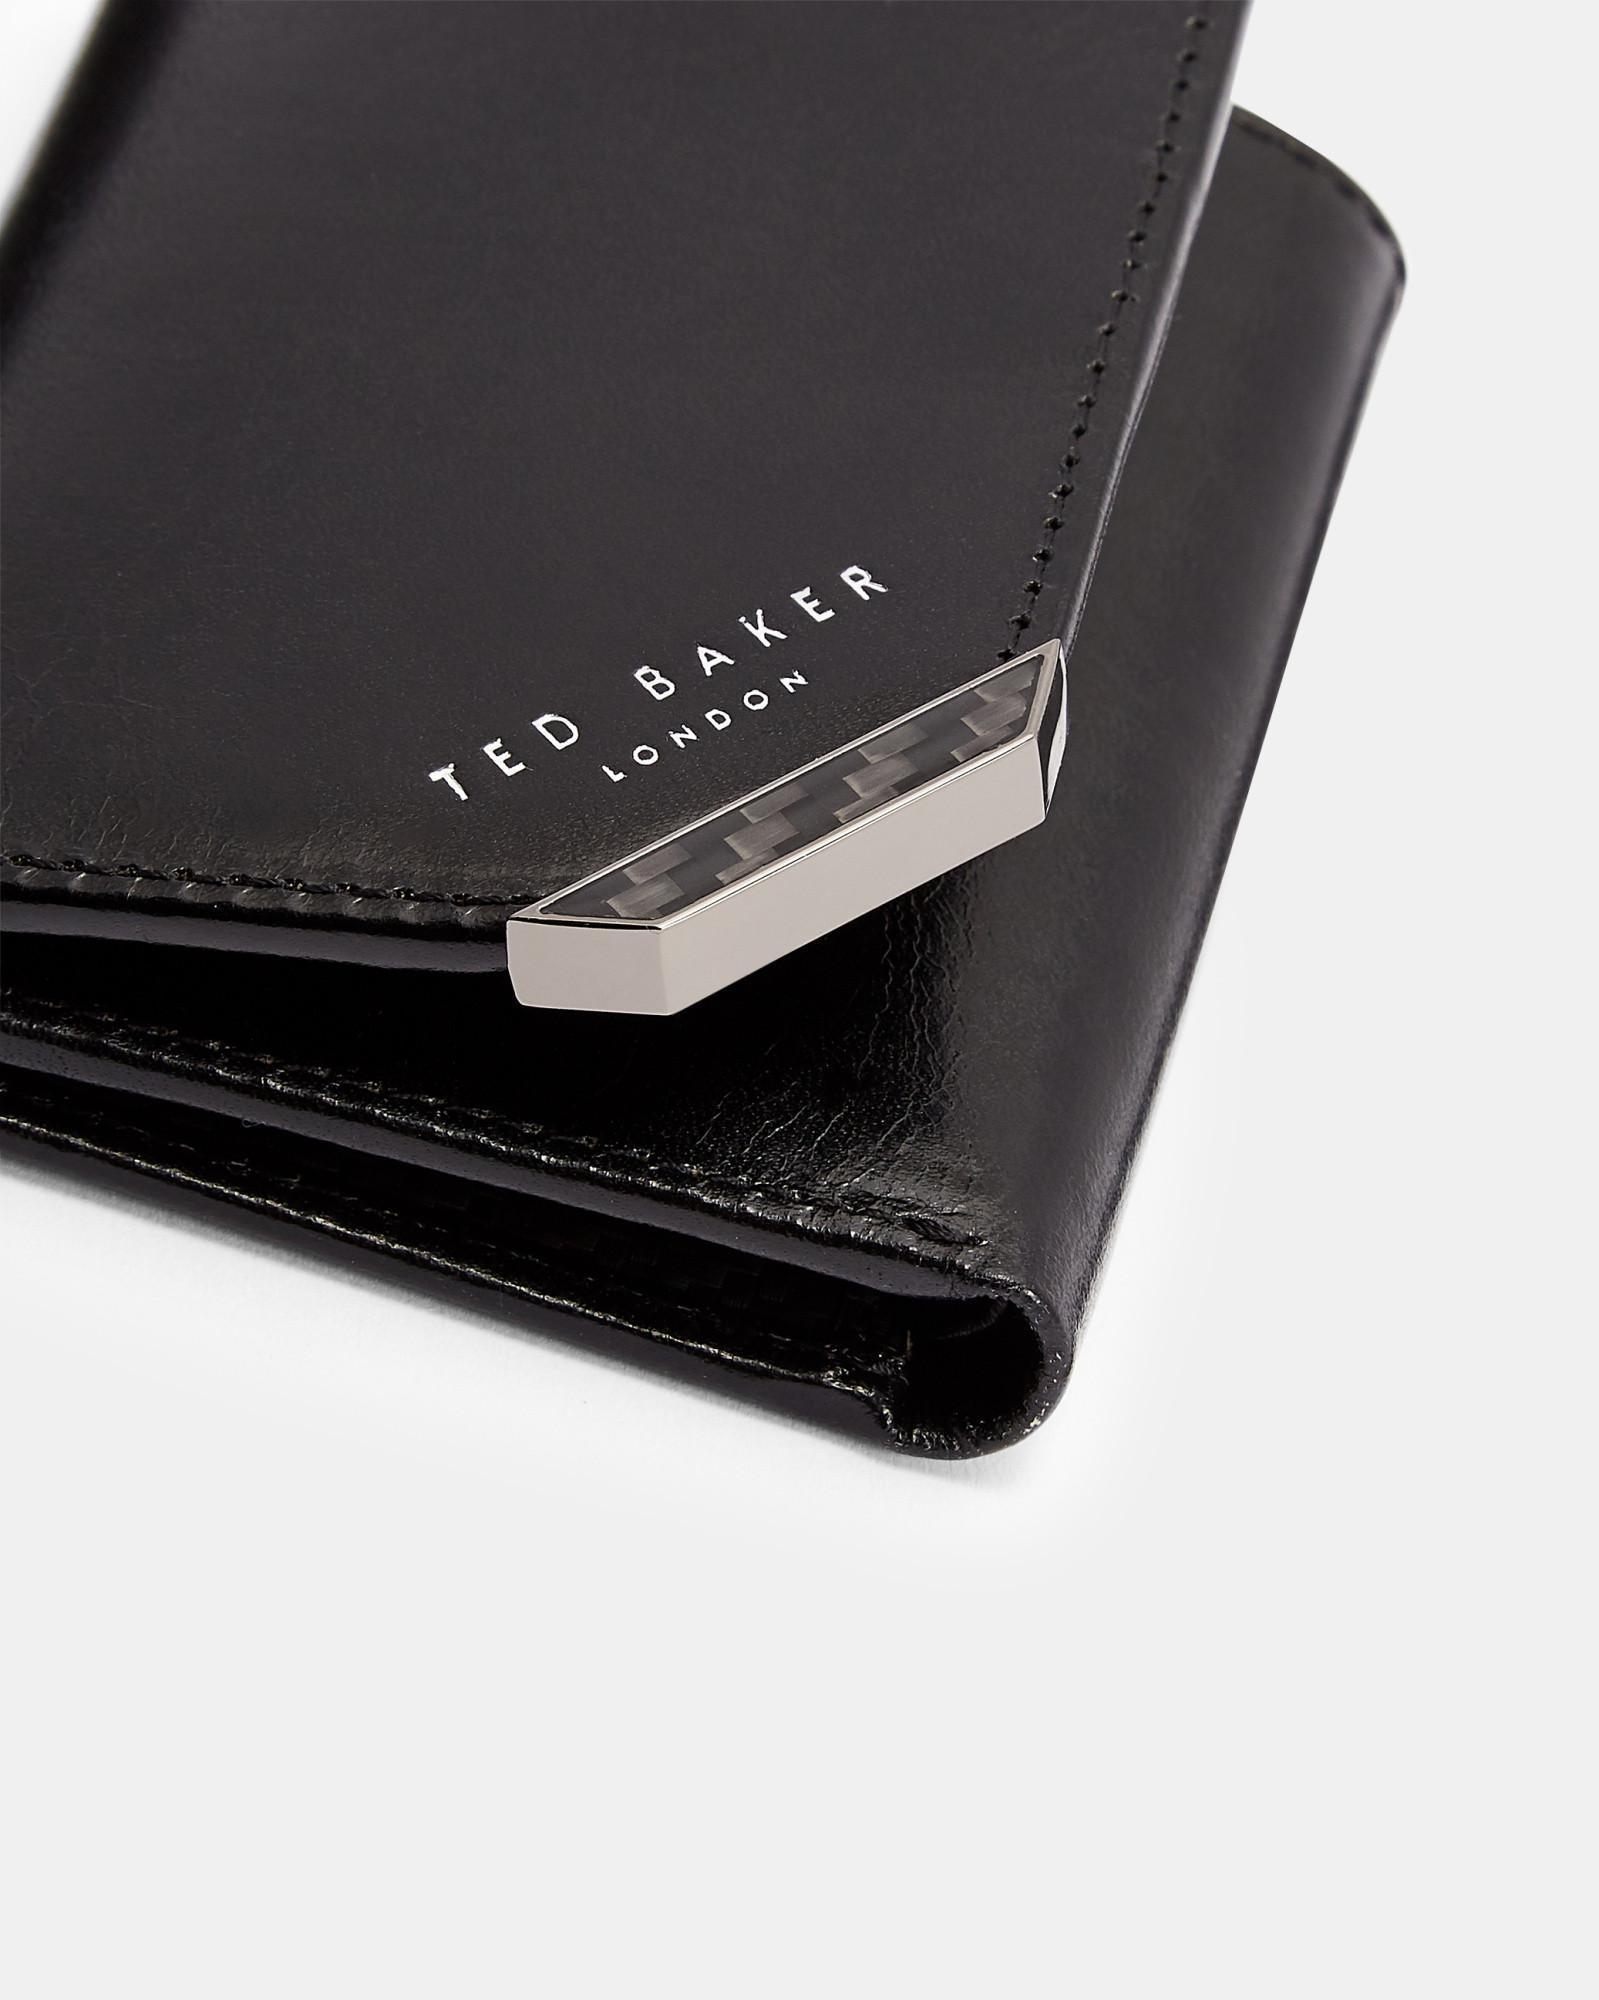 c64a0693d62 Ted Baker - Black Carbon Fibre Trifold Leather Wallet for Men - Lyst. View  fullscreen